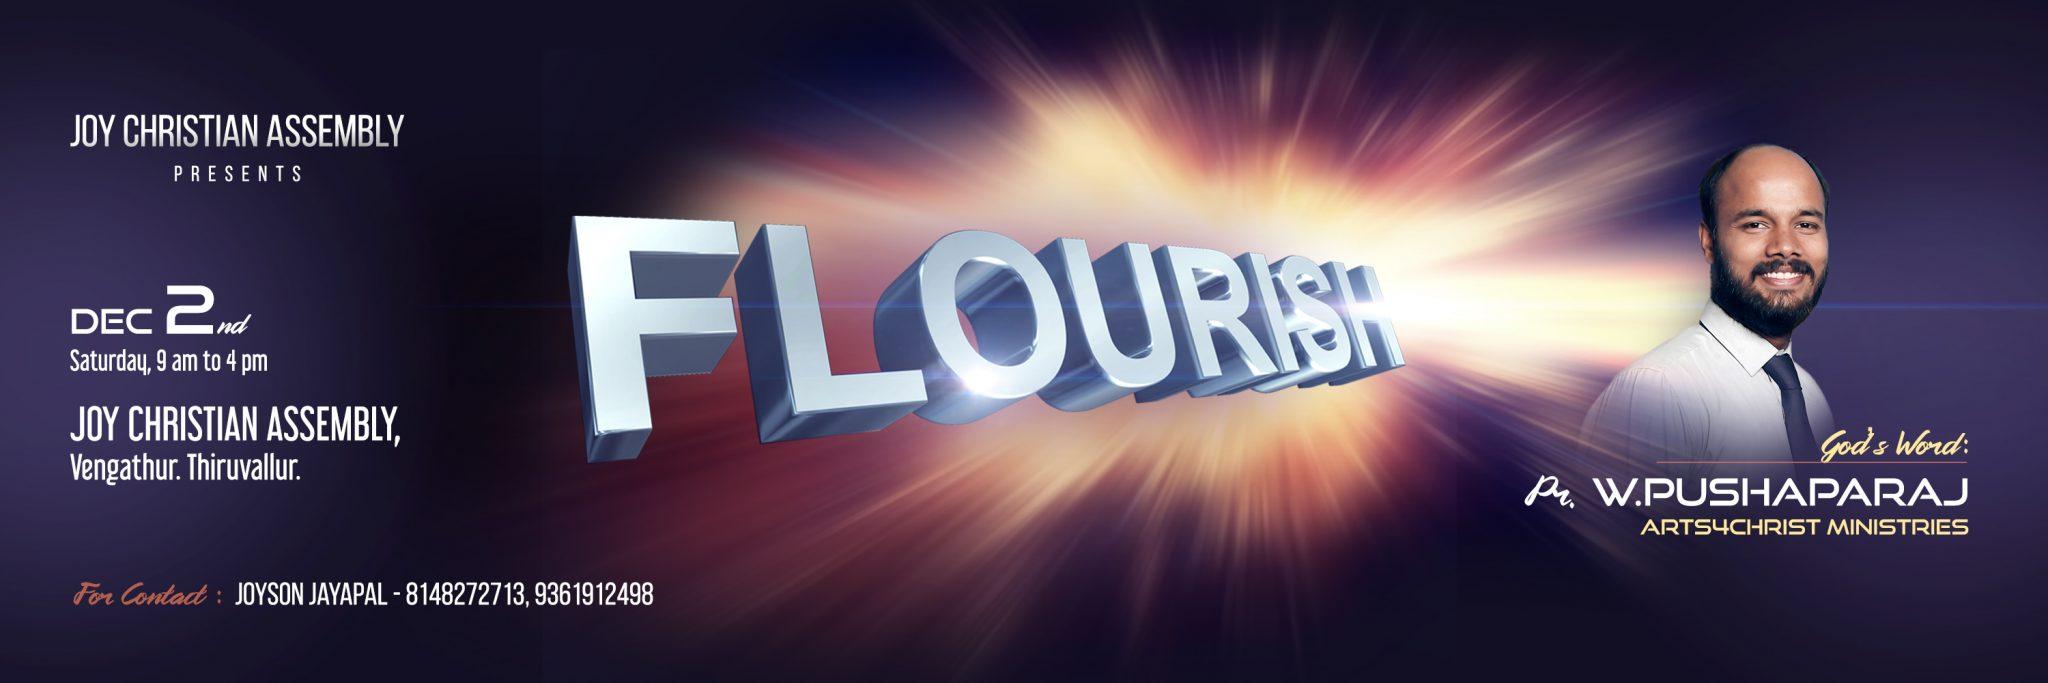 Event Slide - Flourish 2017